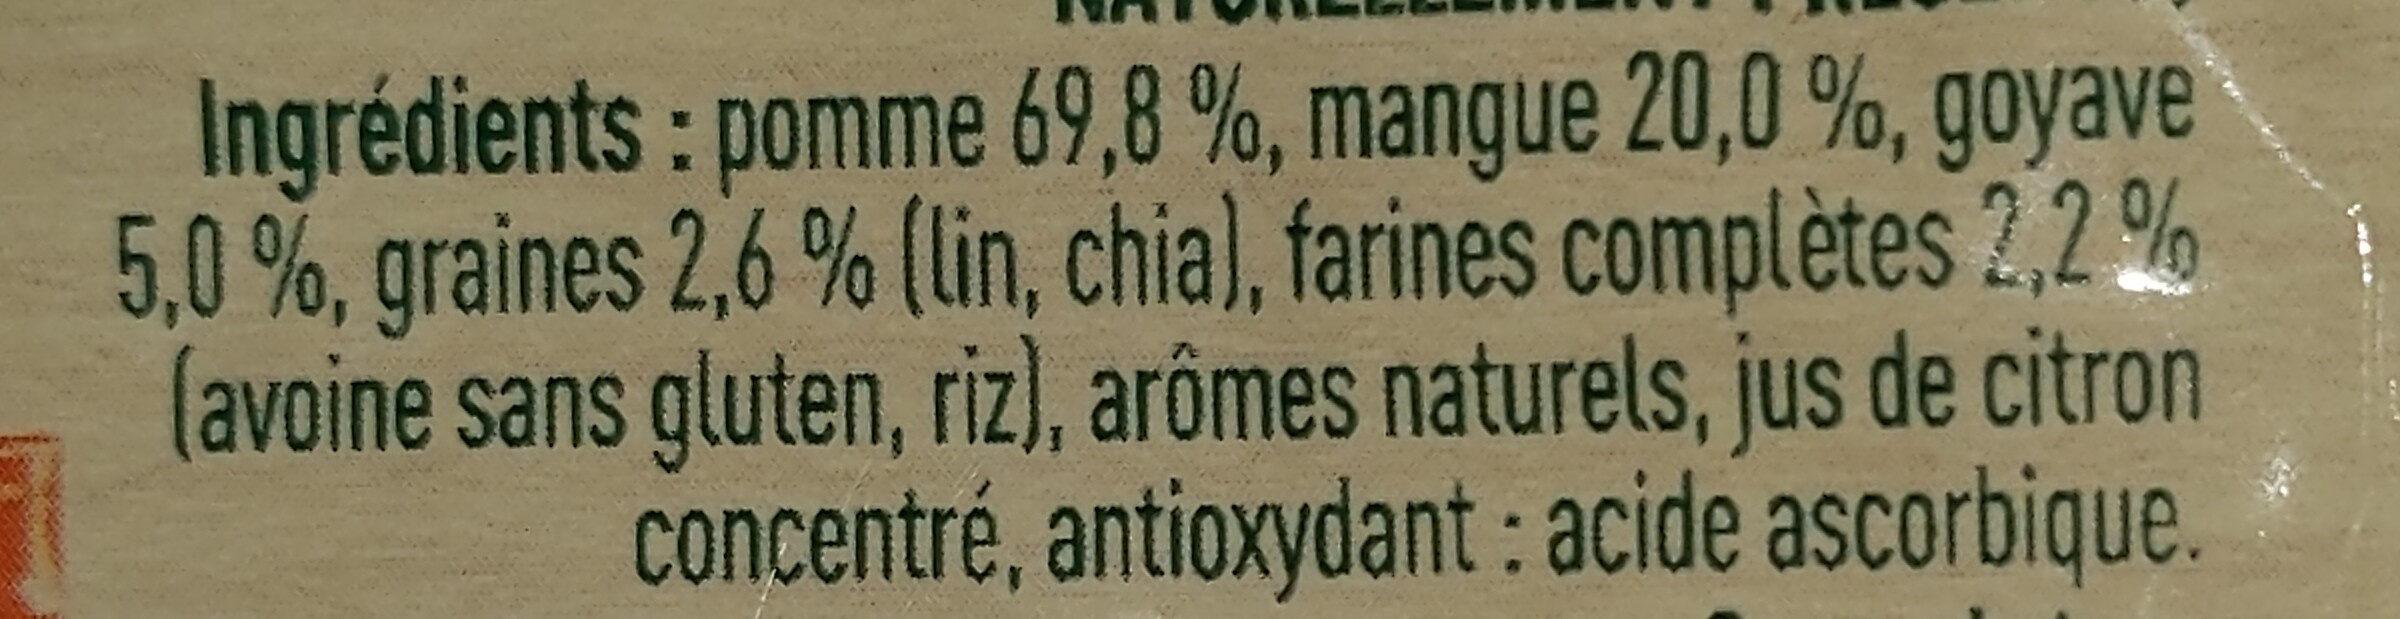 Pomme mangue goyave - Ingredienti - fr